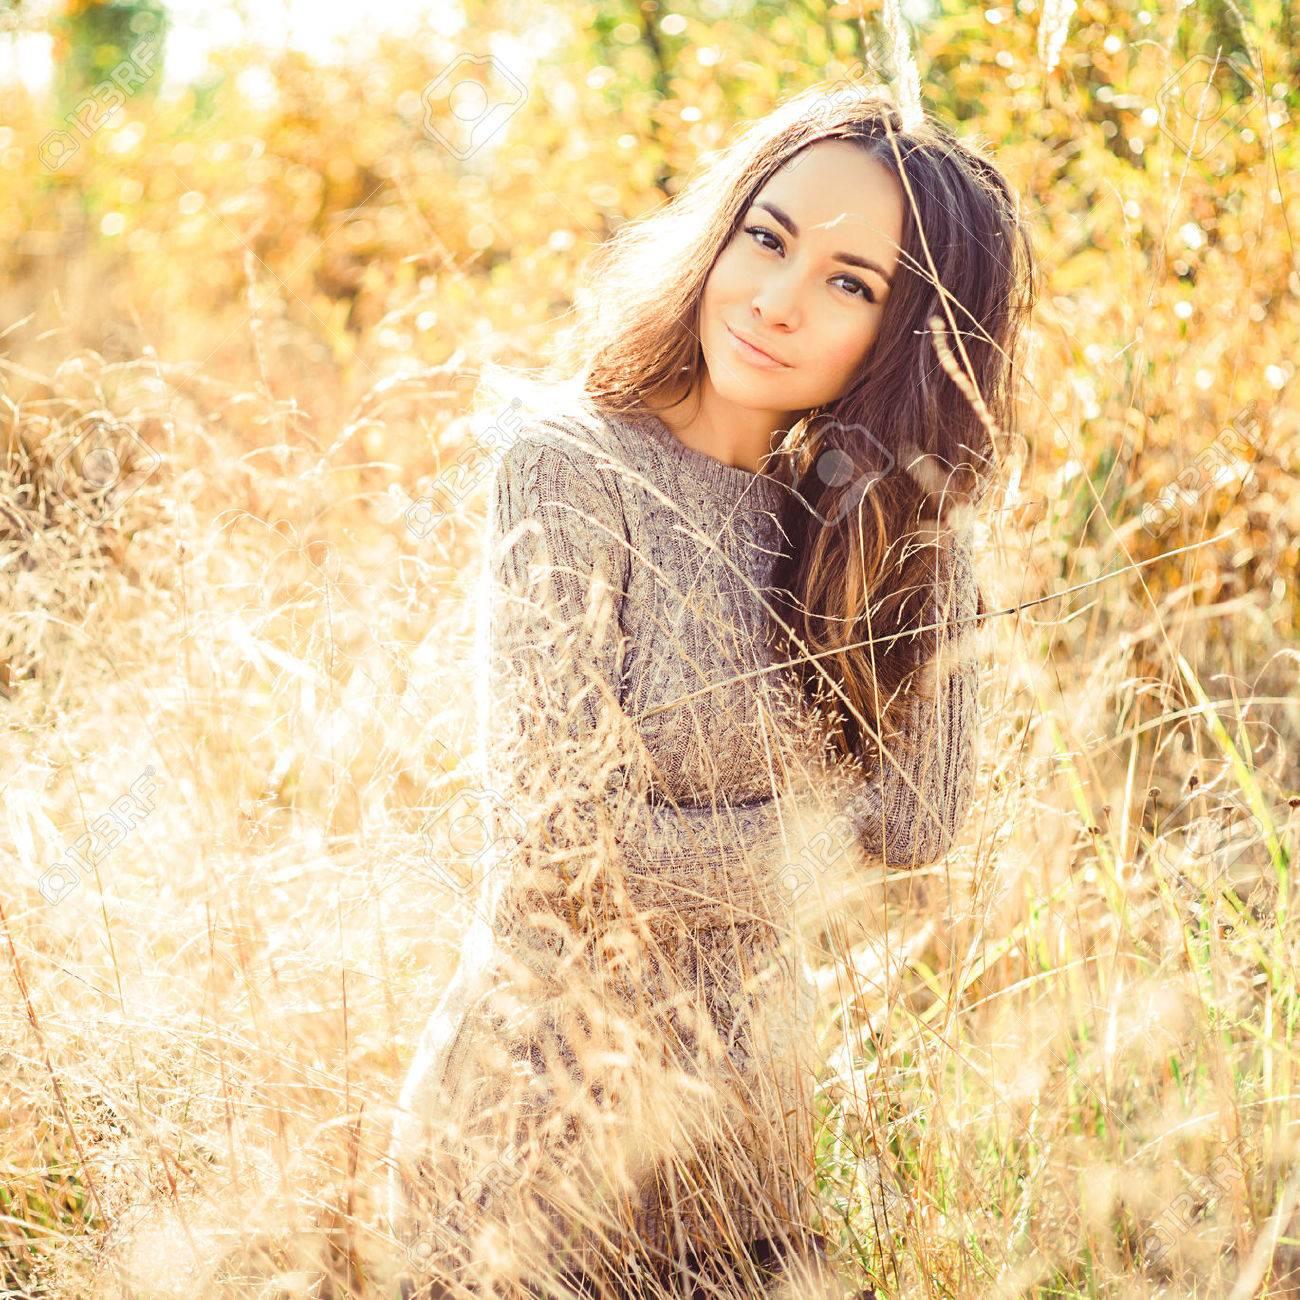 b511ef0ea994e4 Outdoor atmospheric fashion photo of young beautiful lady. Autumn field.  Autumn lanscape. Warm